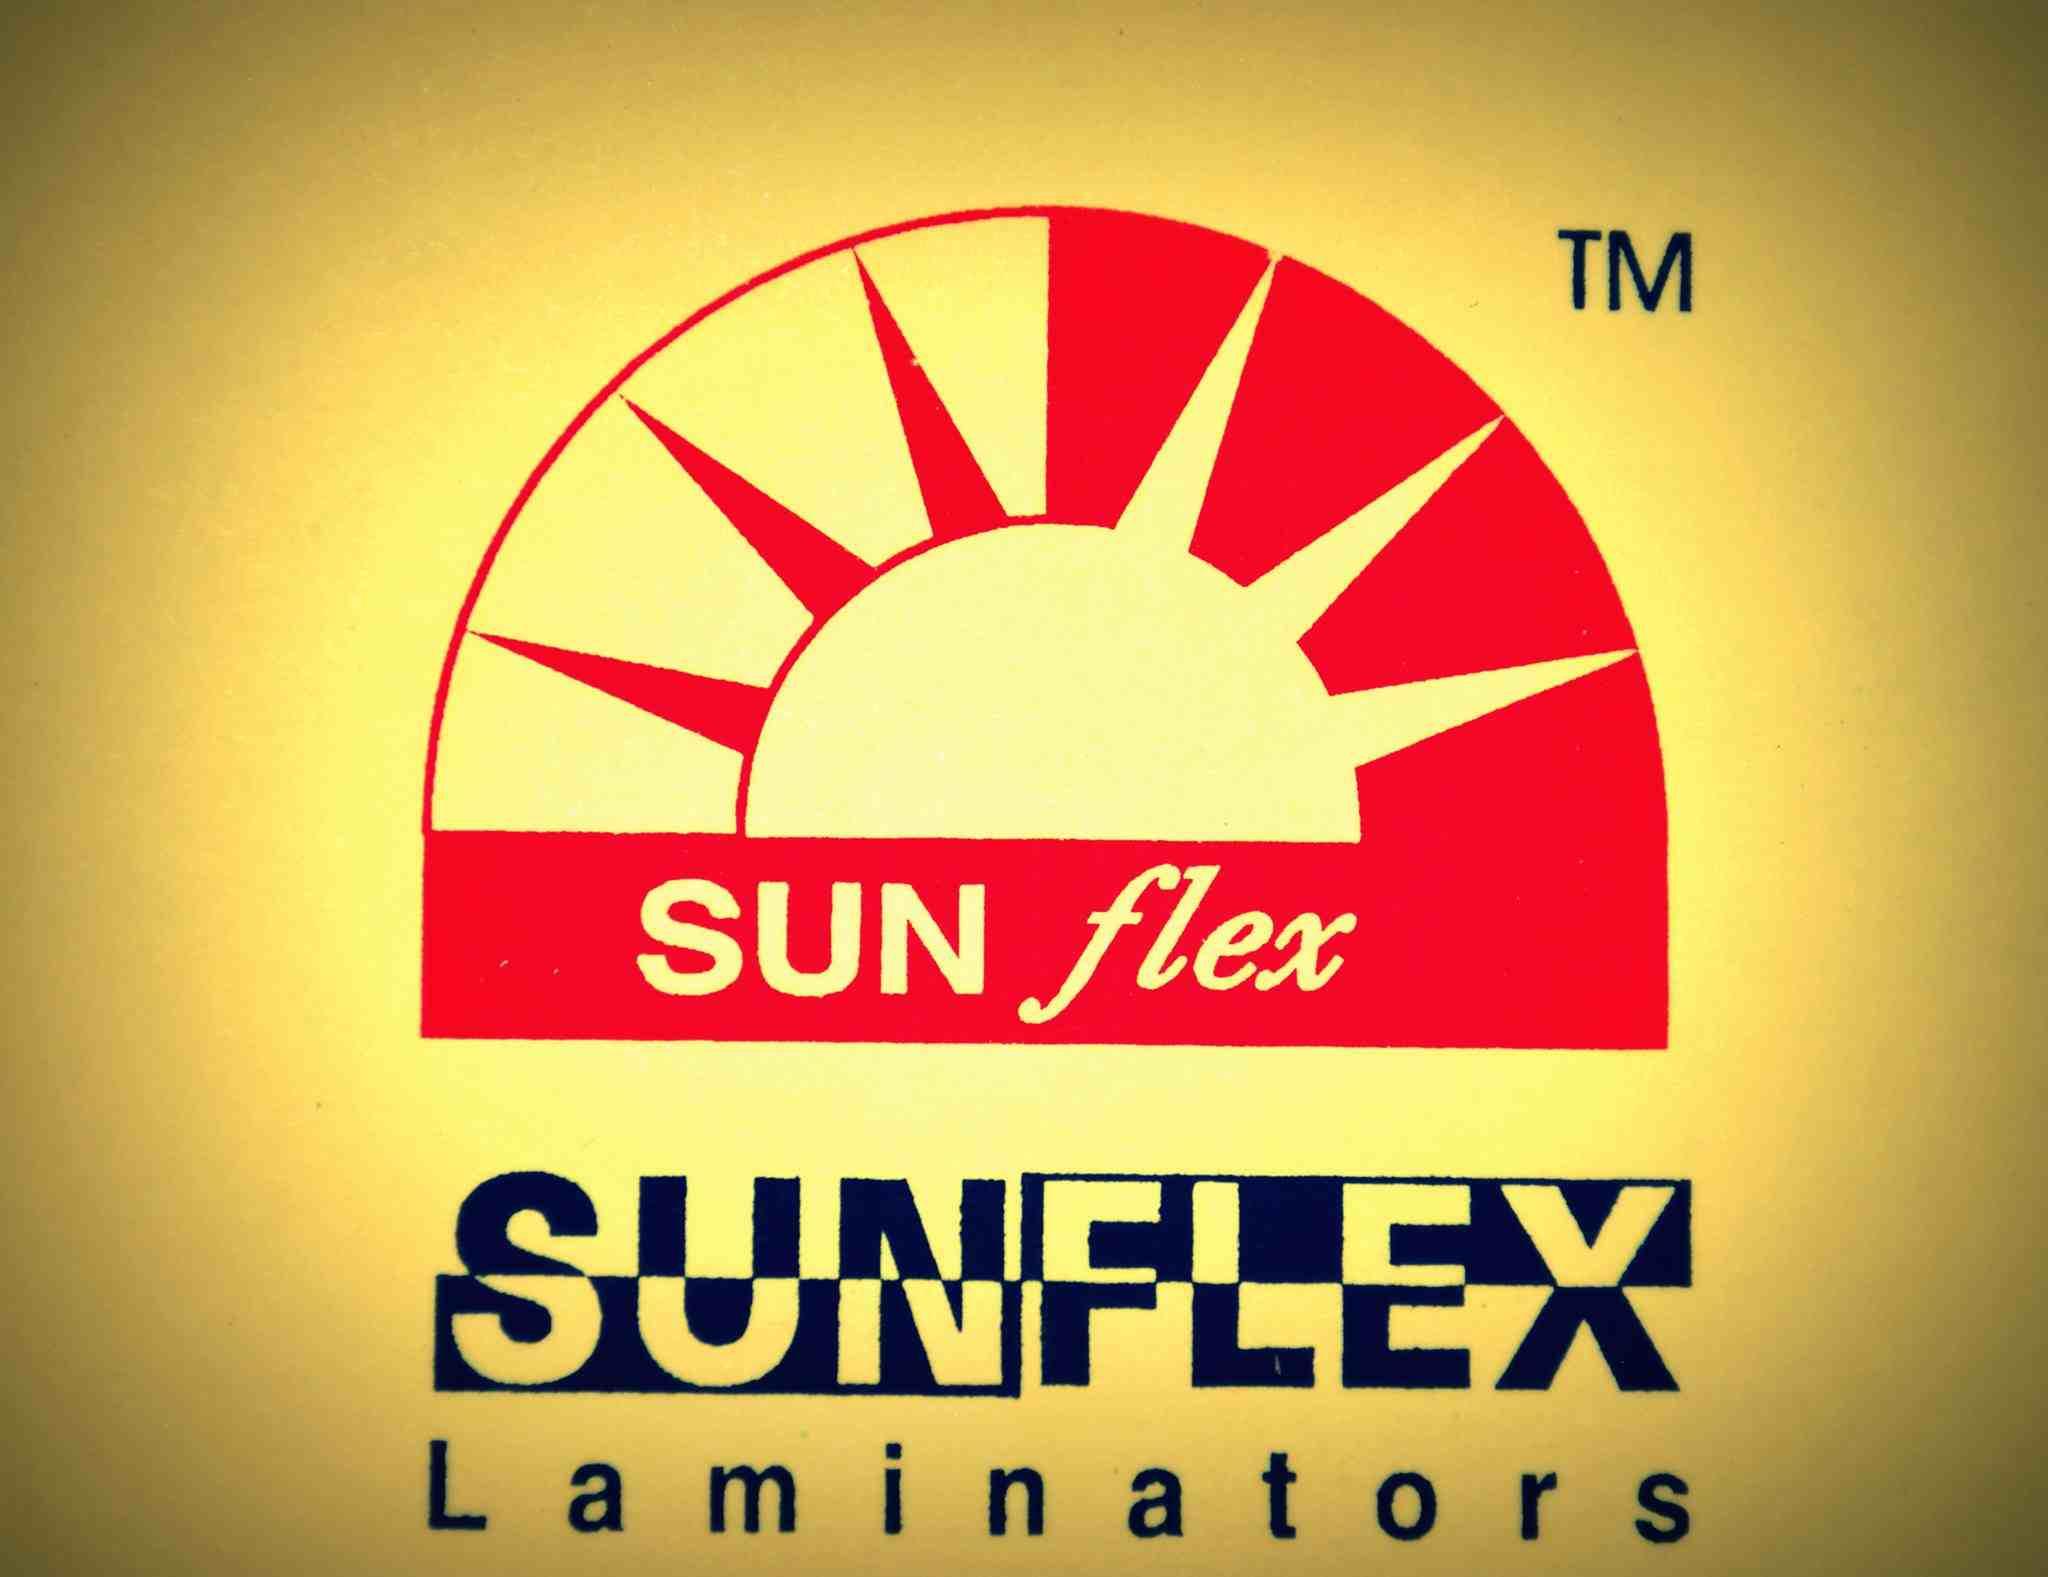 Sunflex Industries Pvt. Ltd